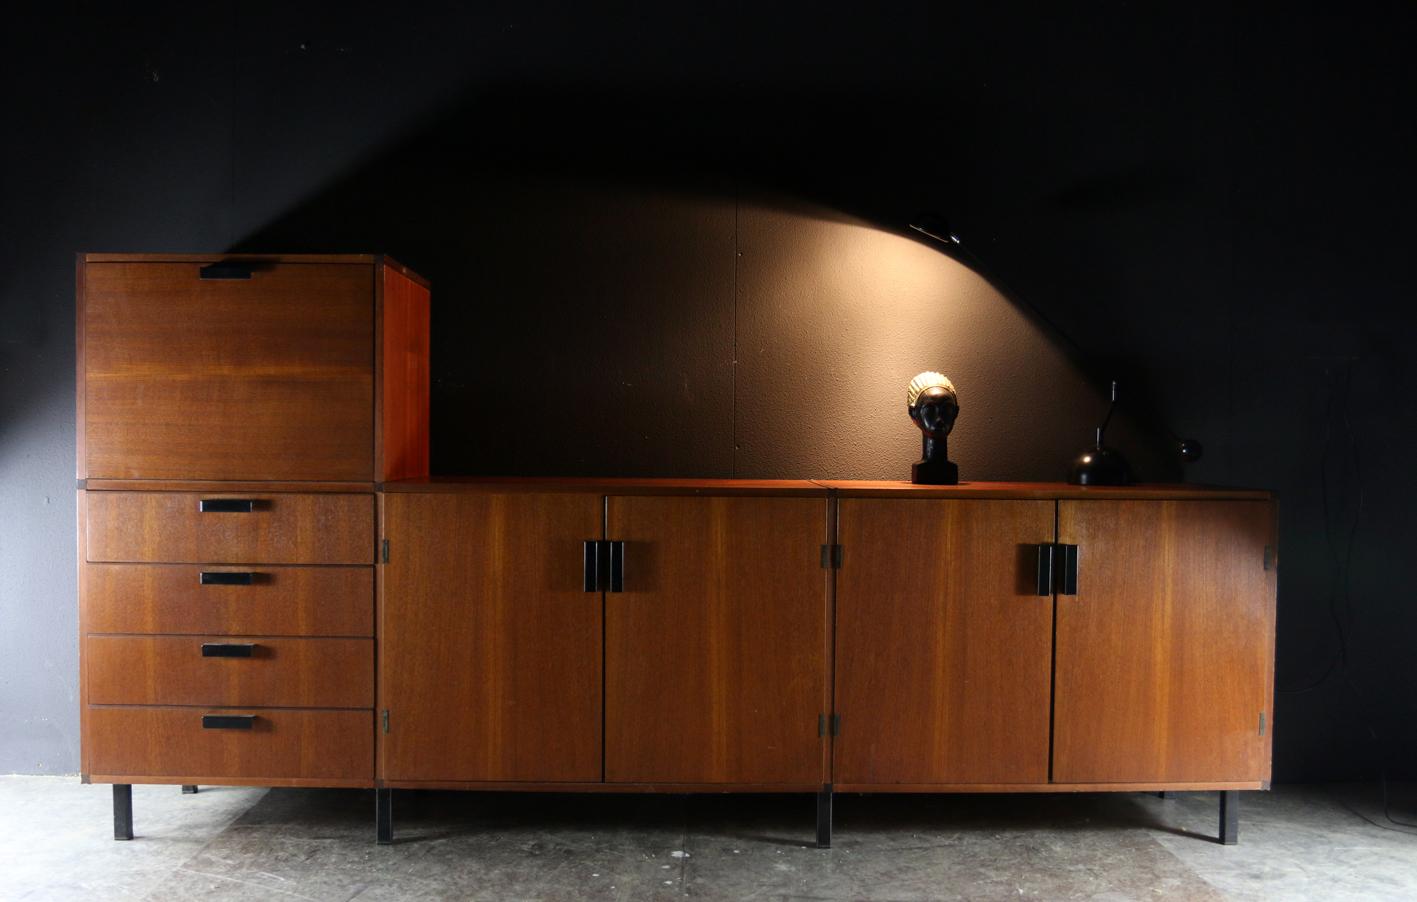 Retro Vintage Pastoe Cees braakman dressoir Made to Measure   Dehuiszwaluw